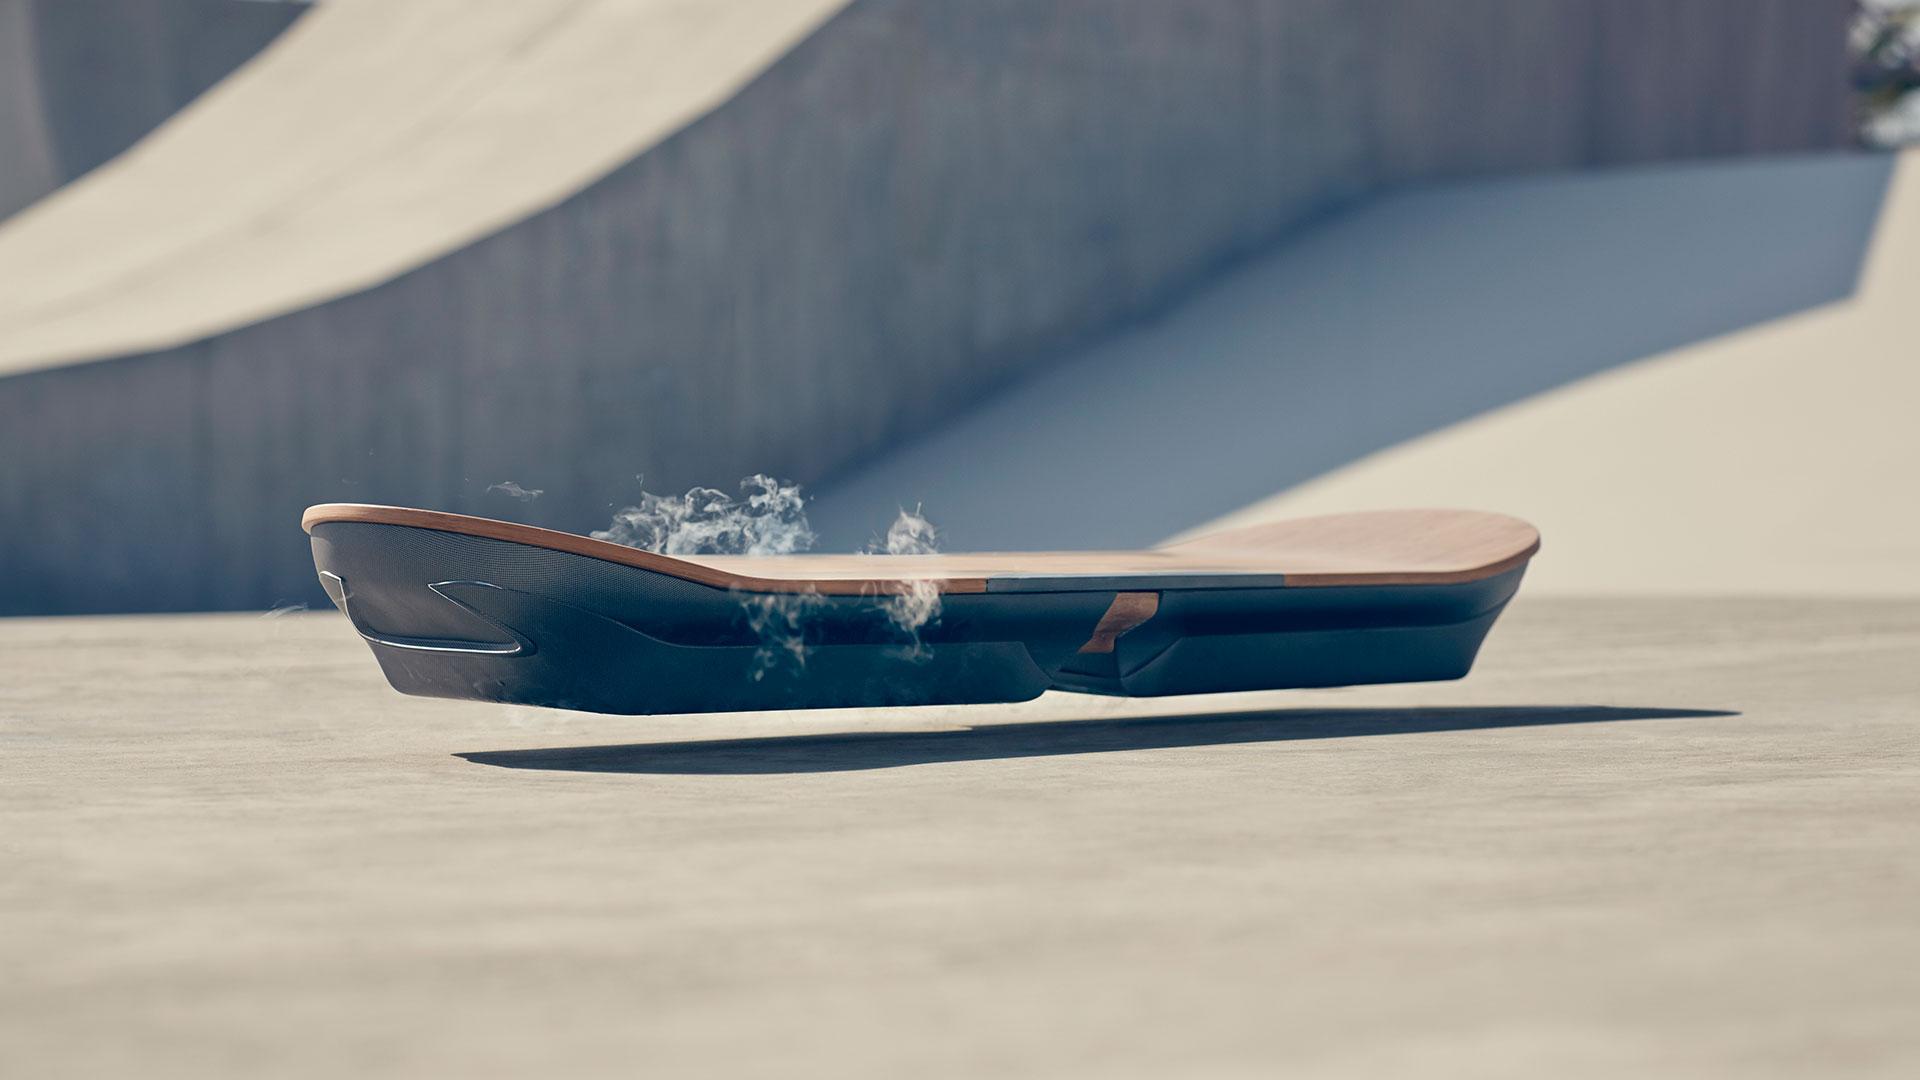 Hoverboard hero asset